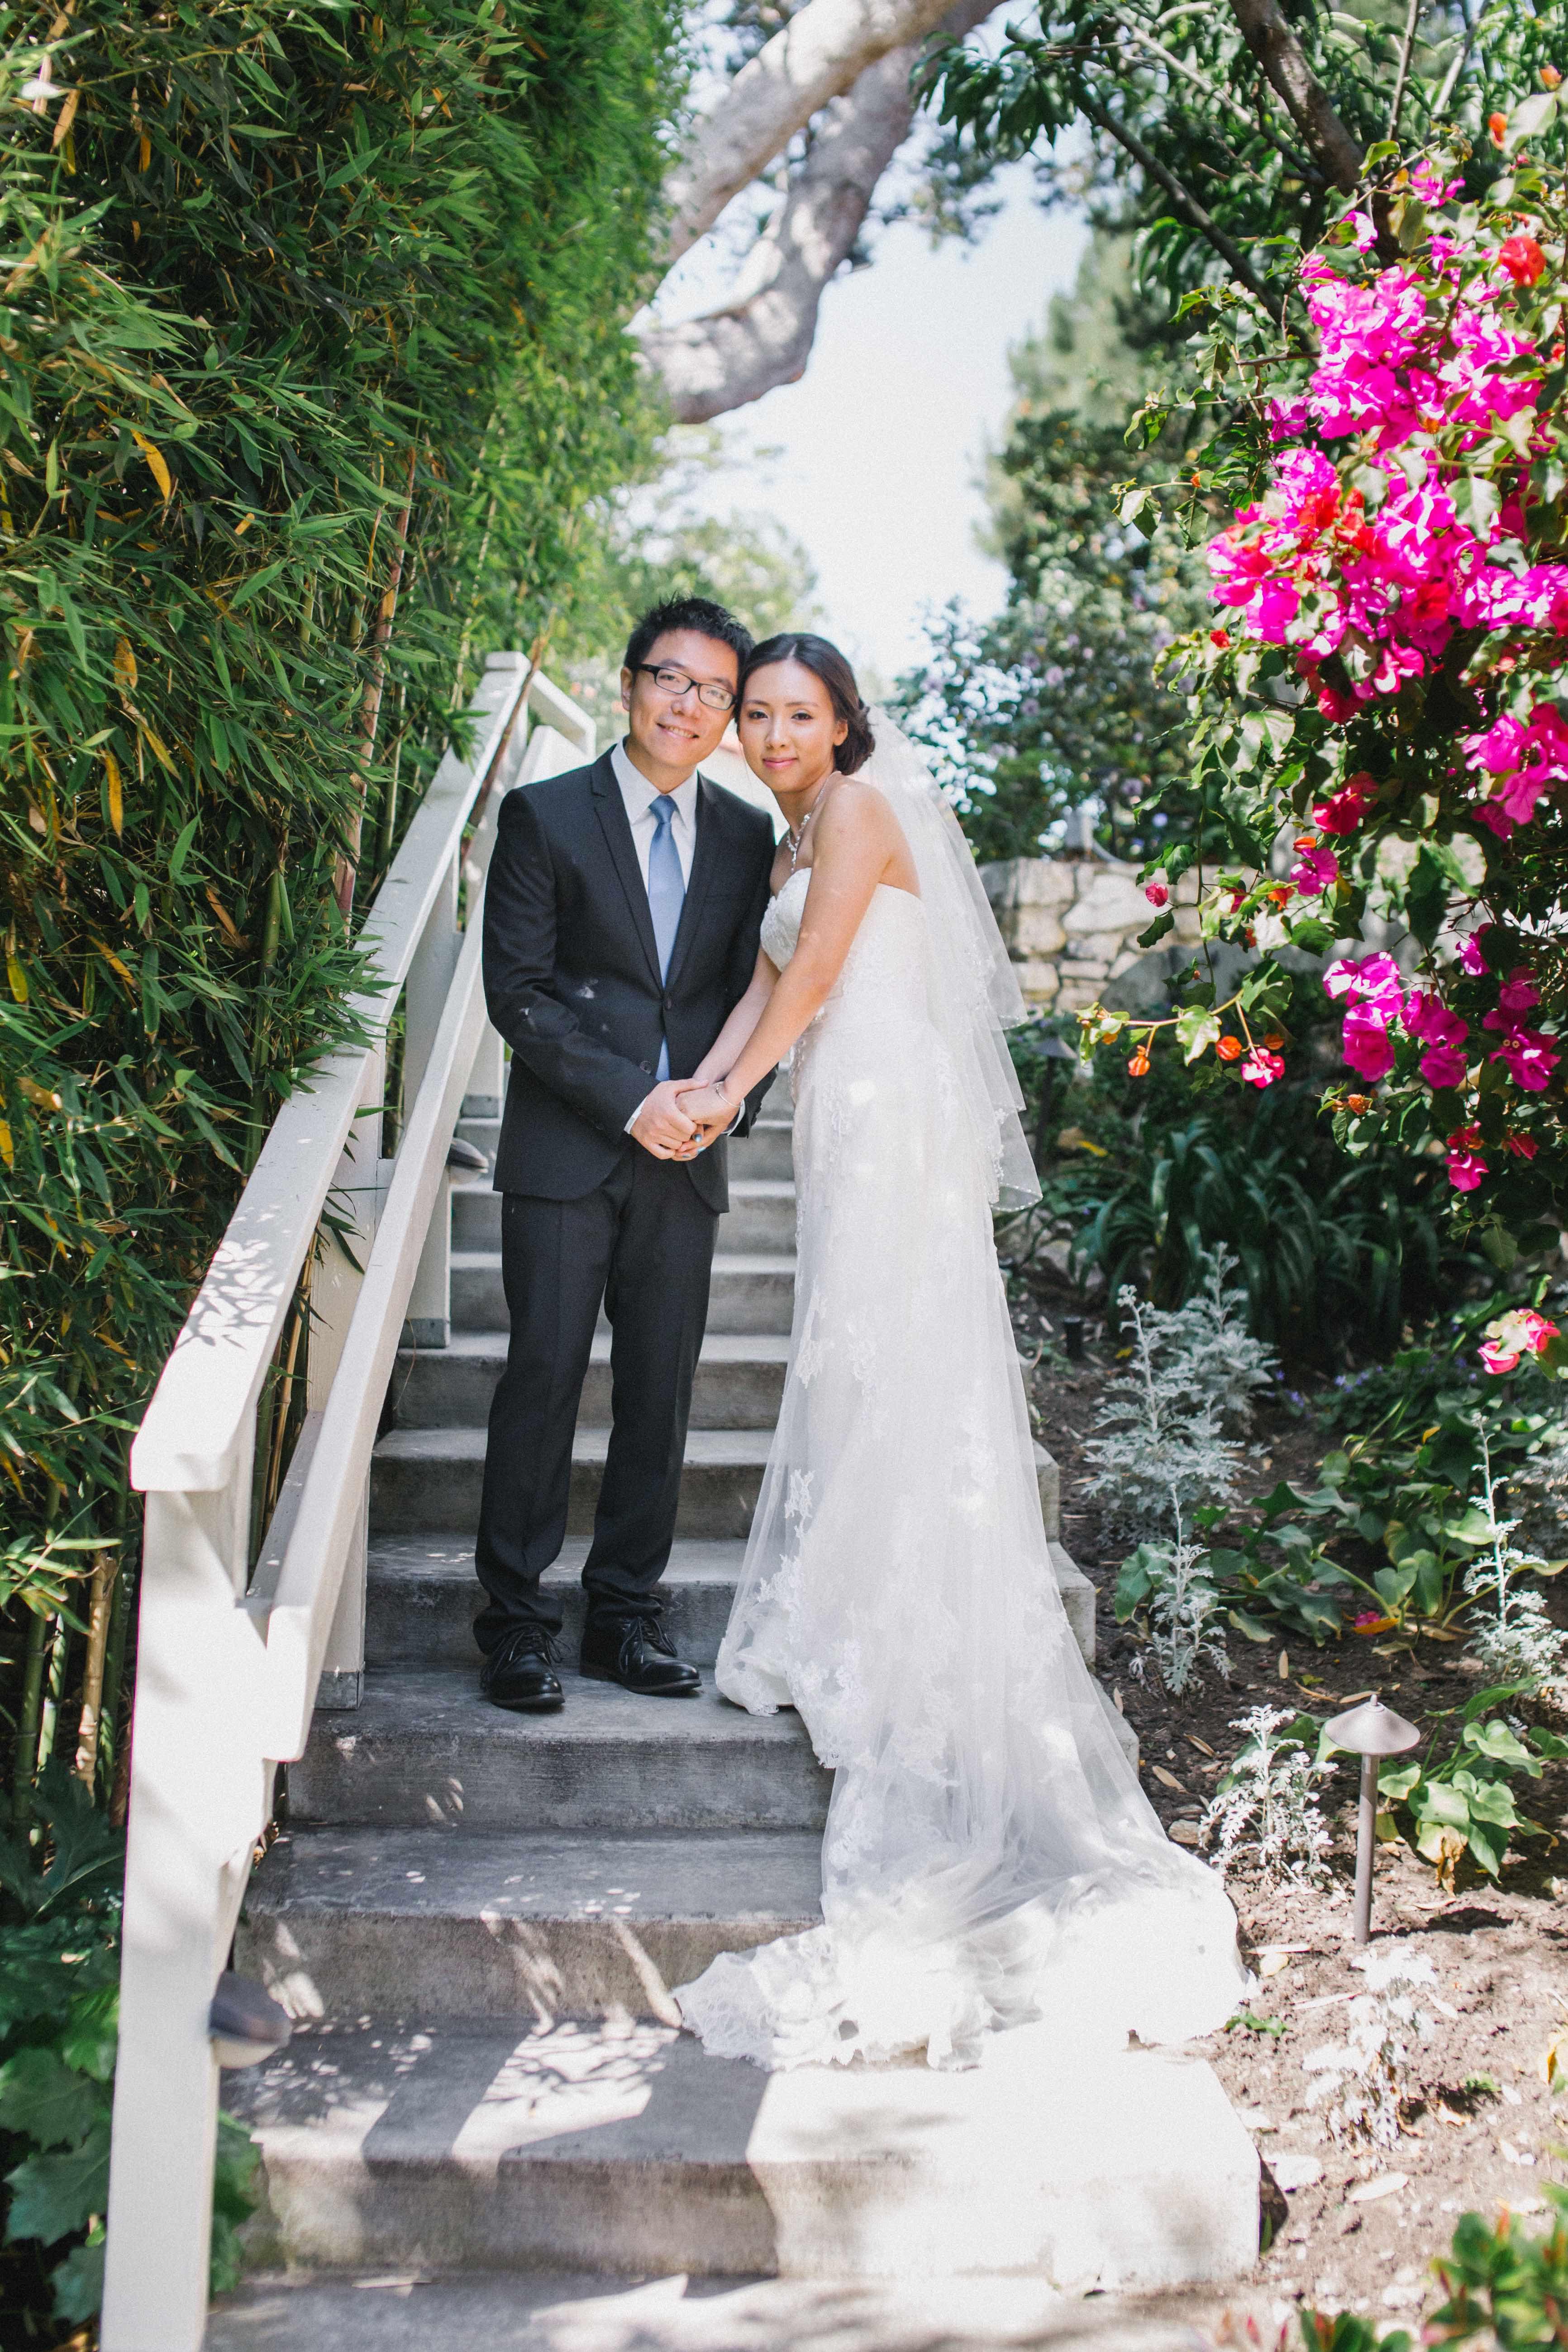 Wedding - La Venta Inn, Palos Verdes Estates | Wedding Photography and Wedding Videography